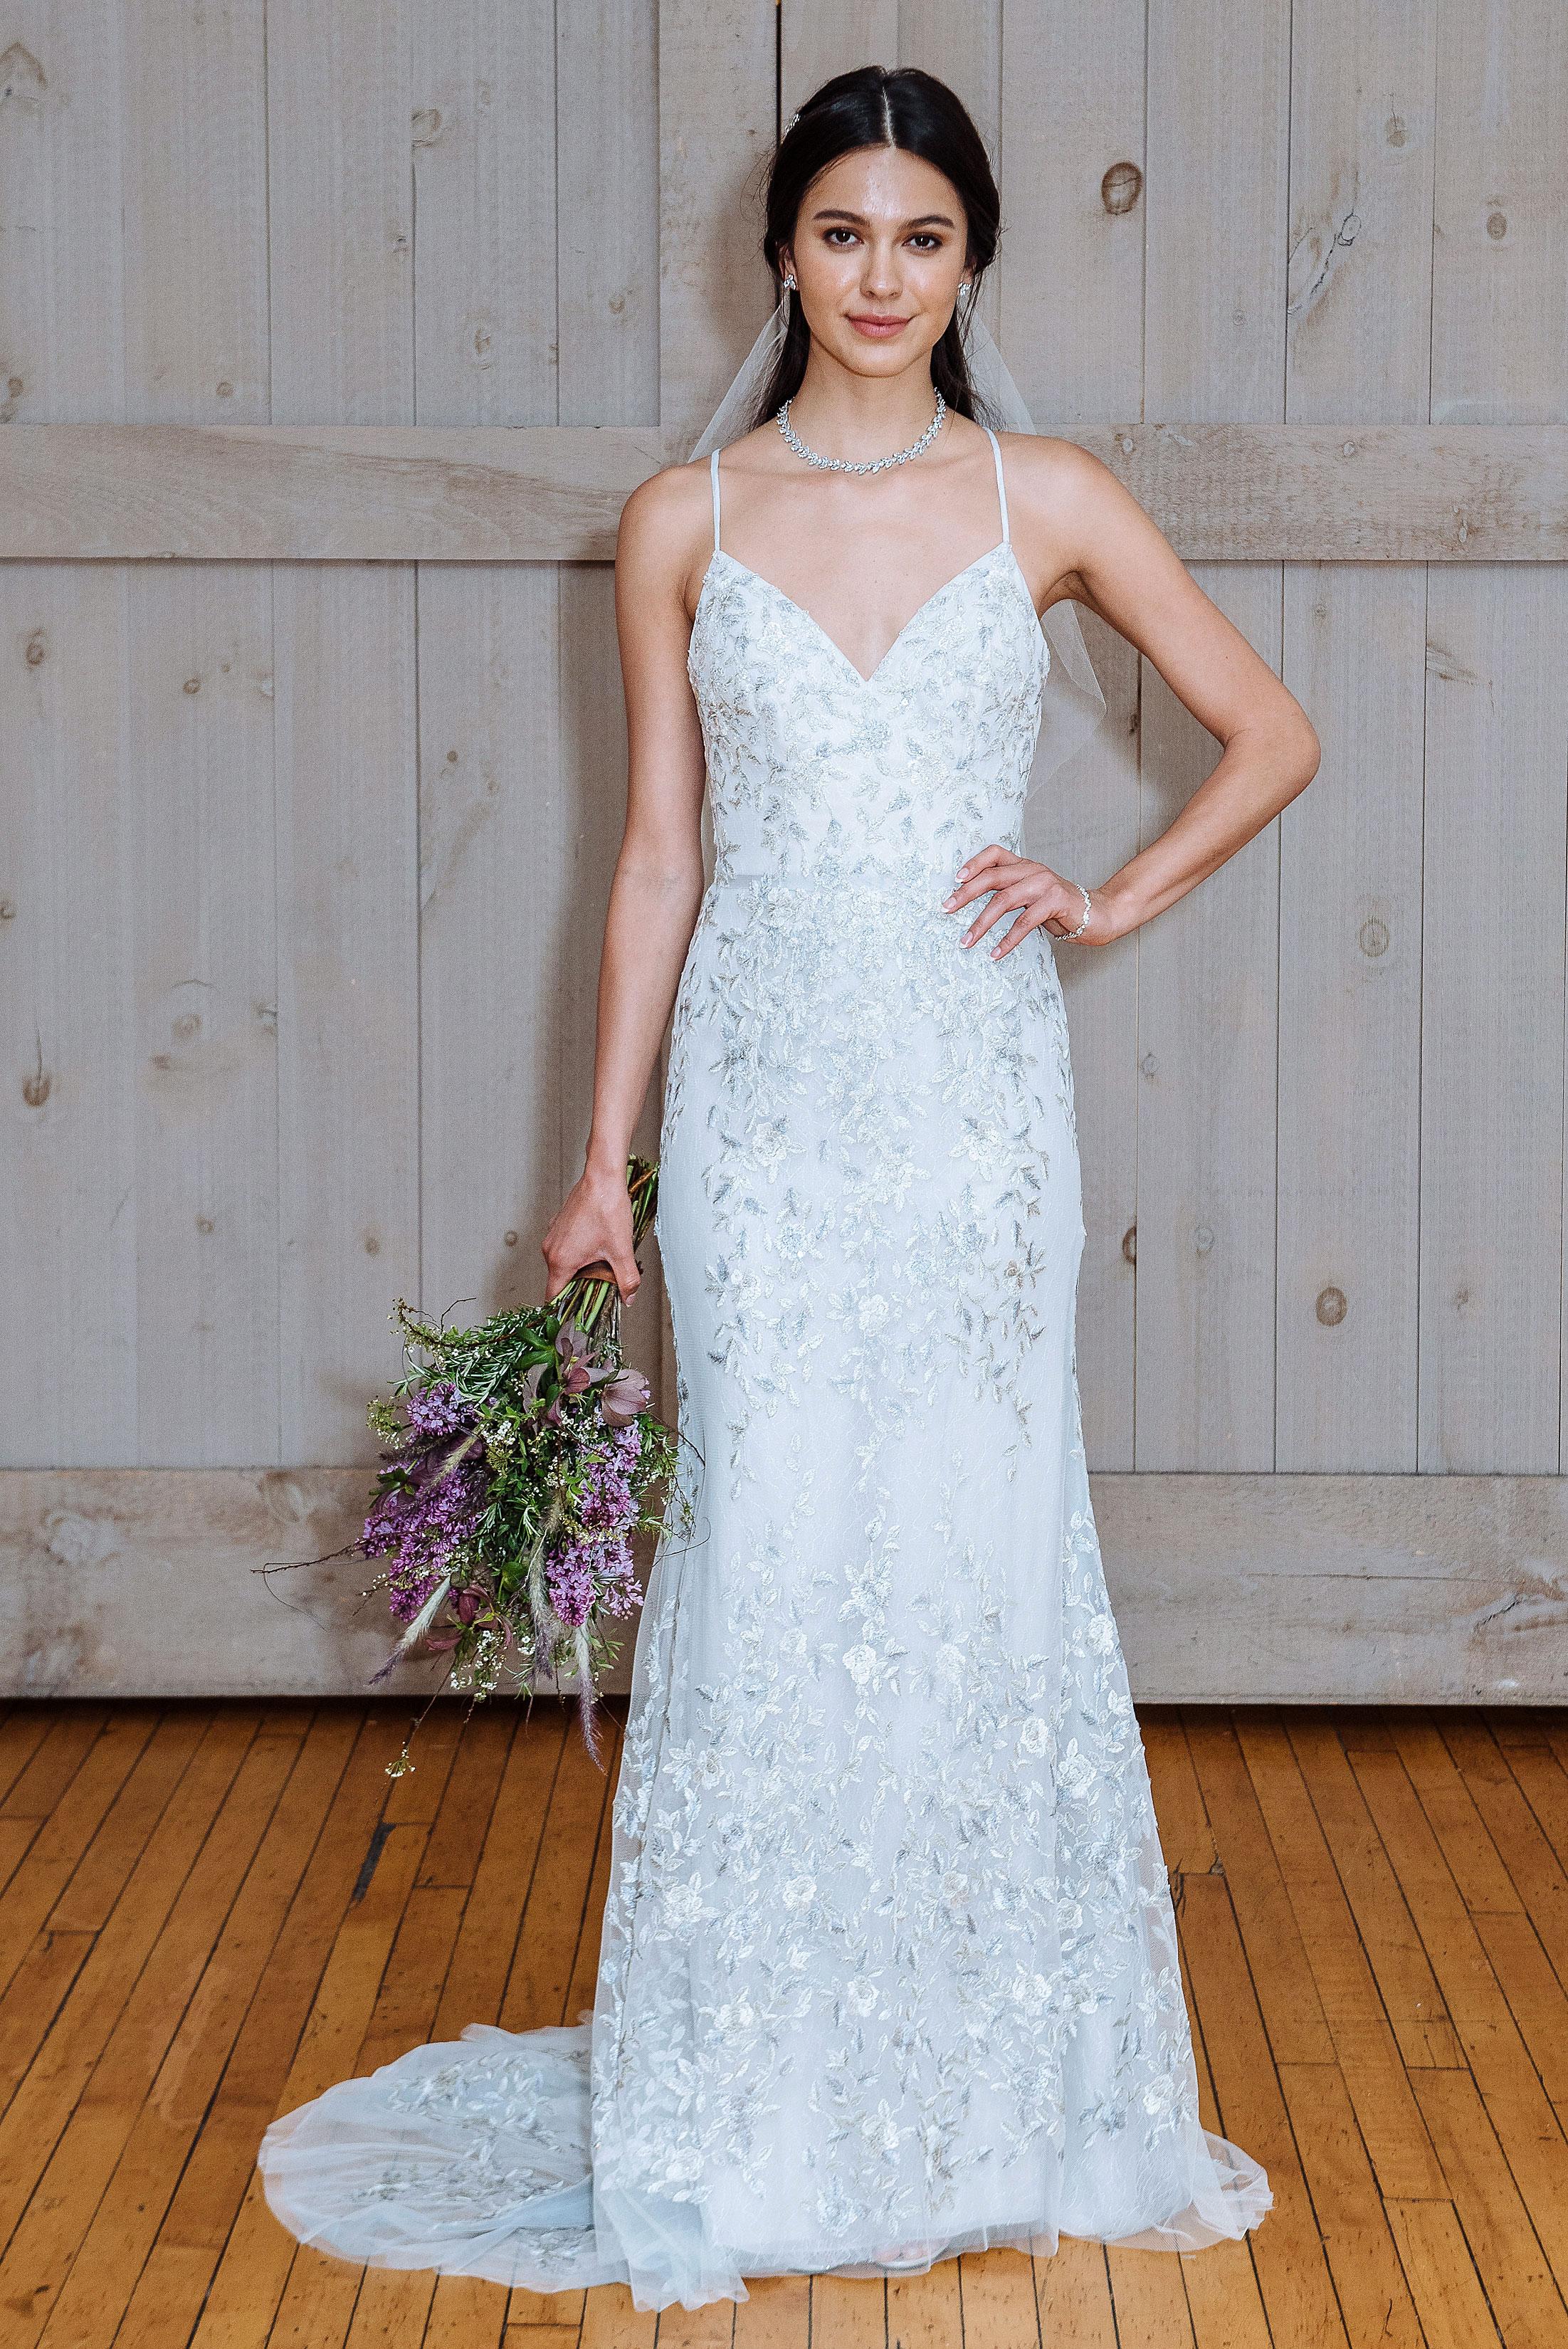 david's bridal spaghetti strap wedding dress spring 2018